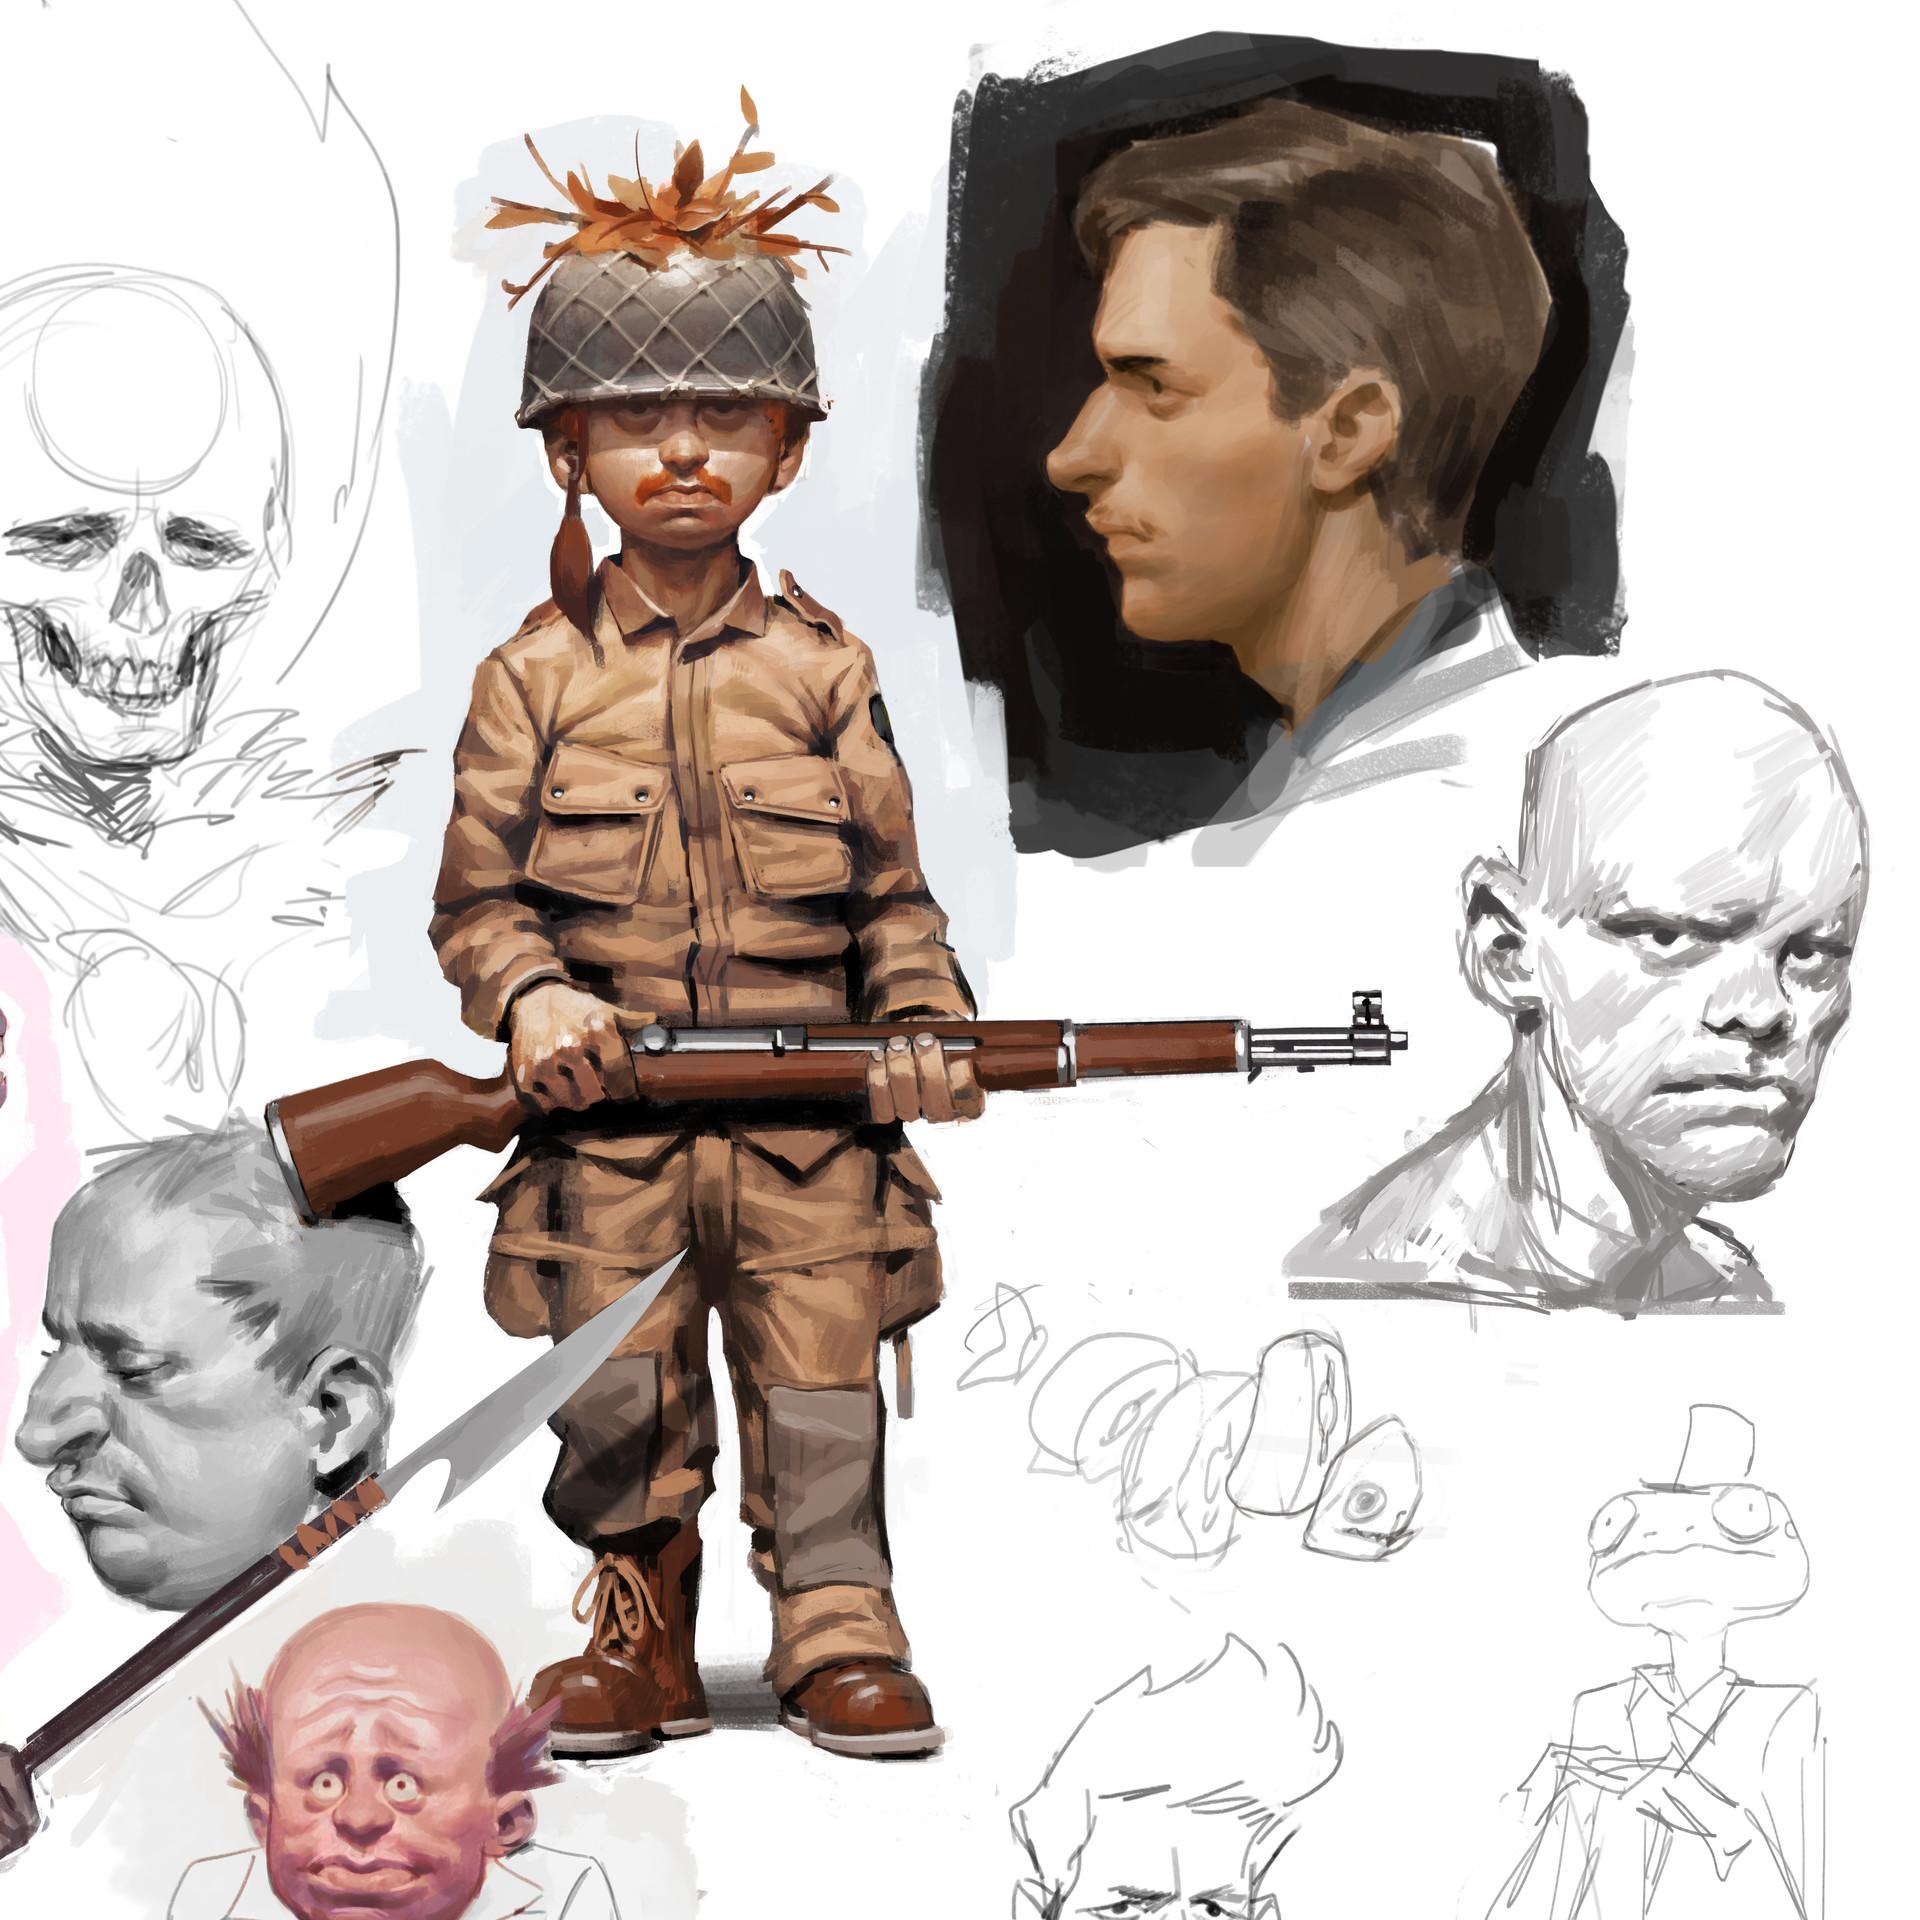 Jens claessens sketchbook2